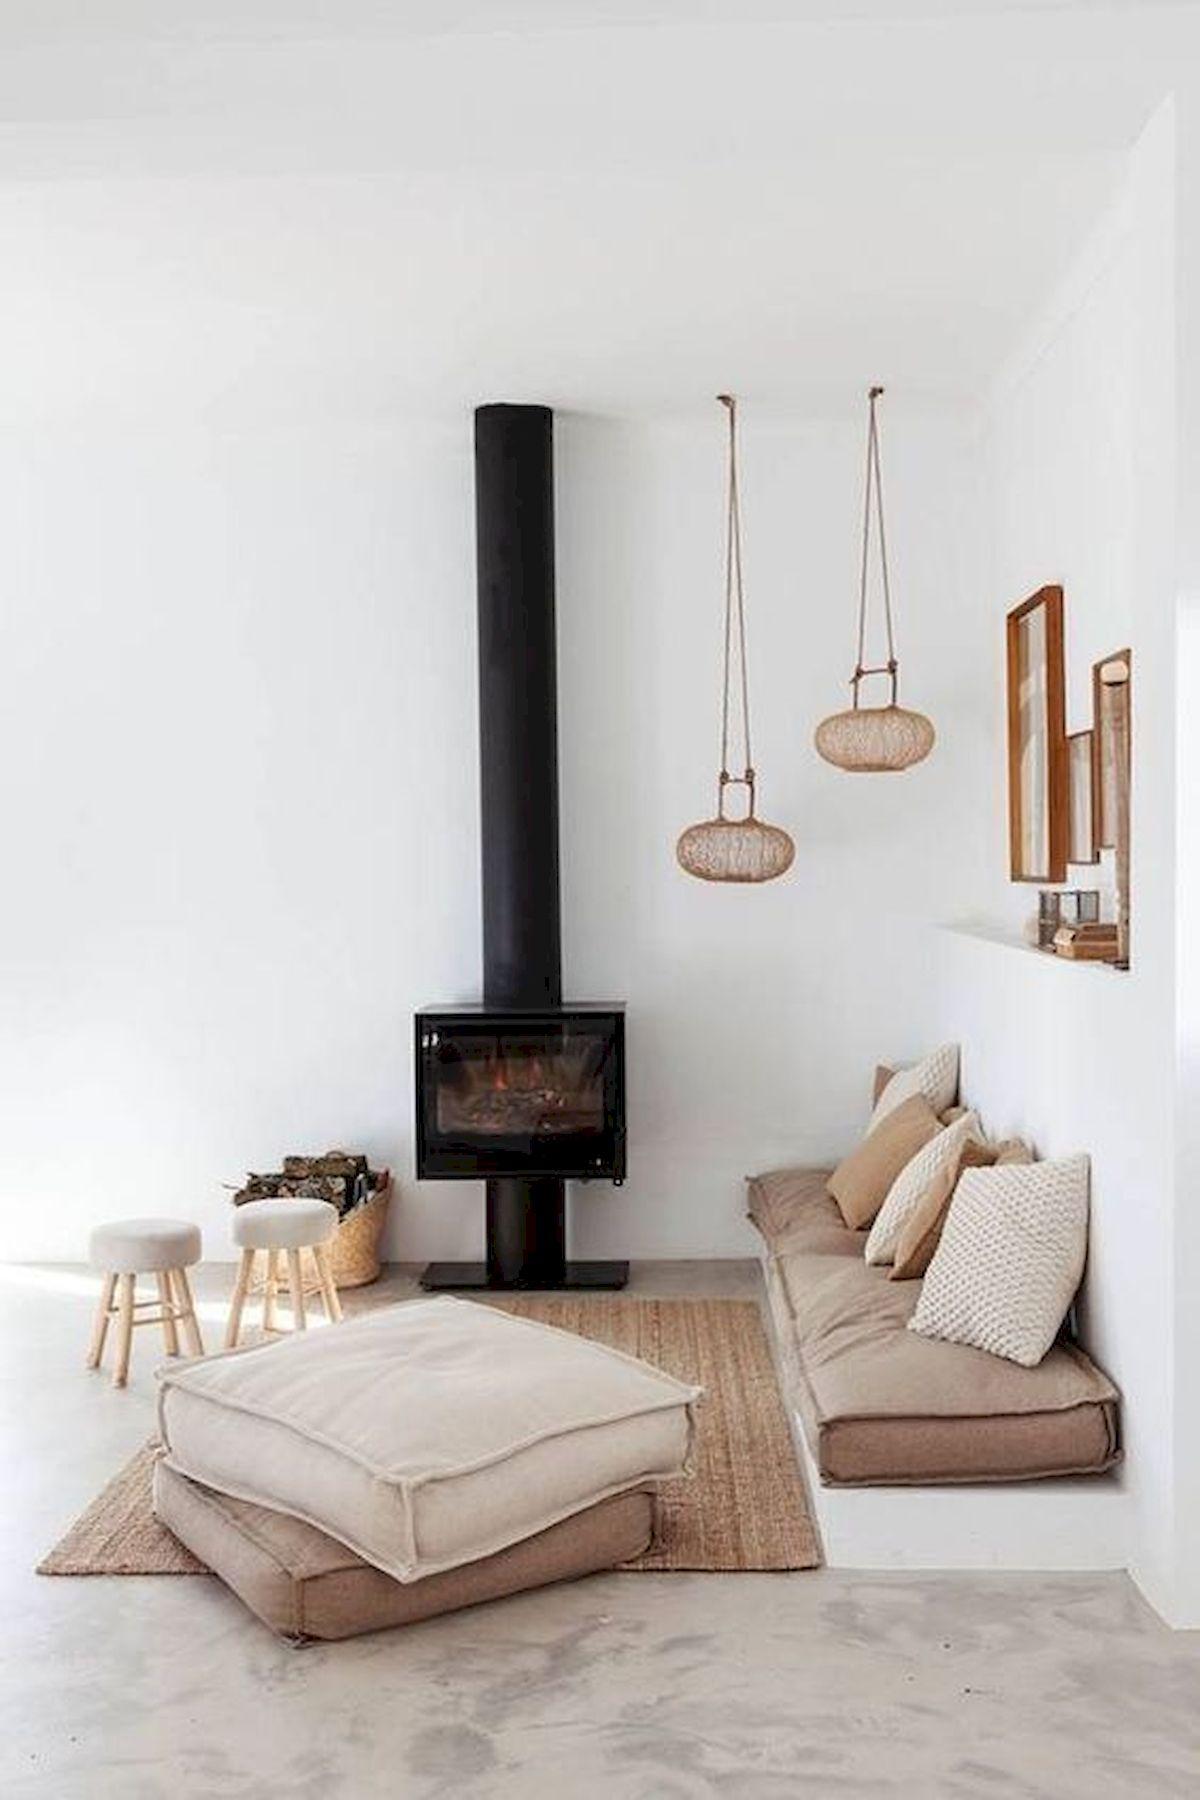 35 Stunning Scandinavian Interior Design and Decor Ideas (6)